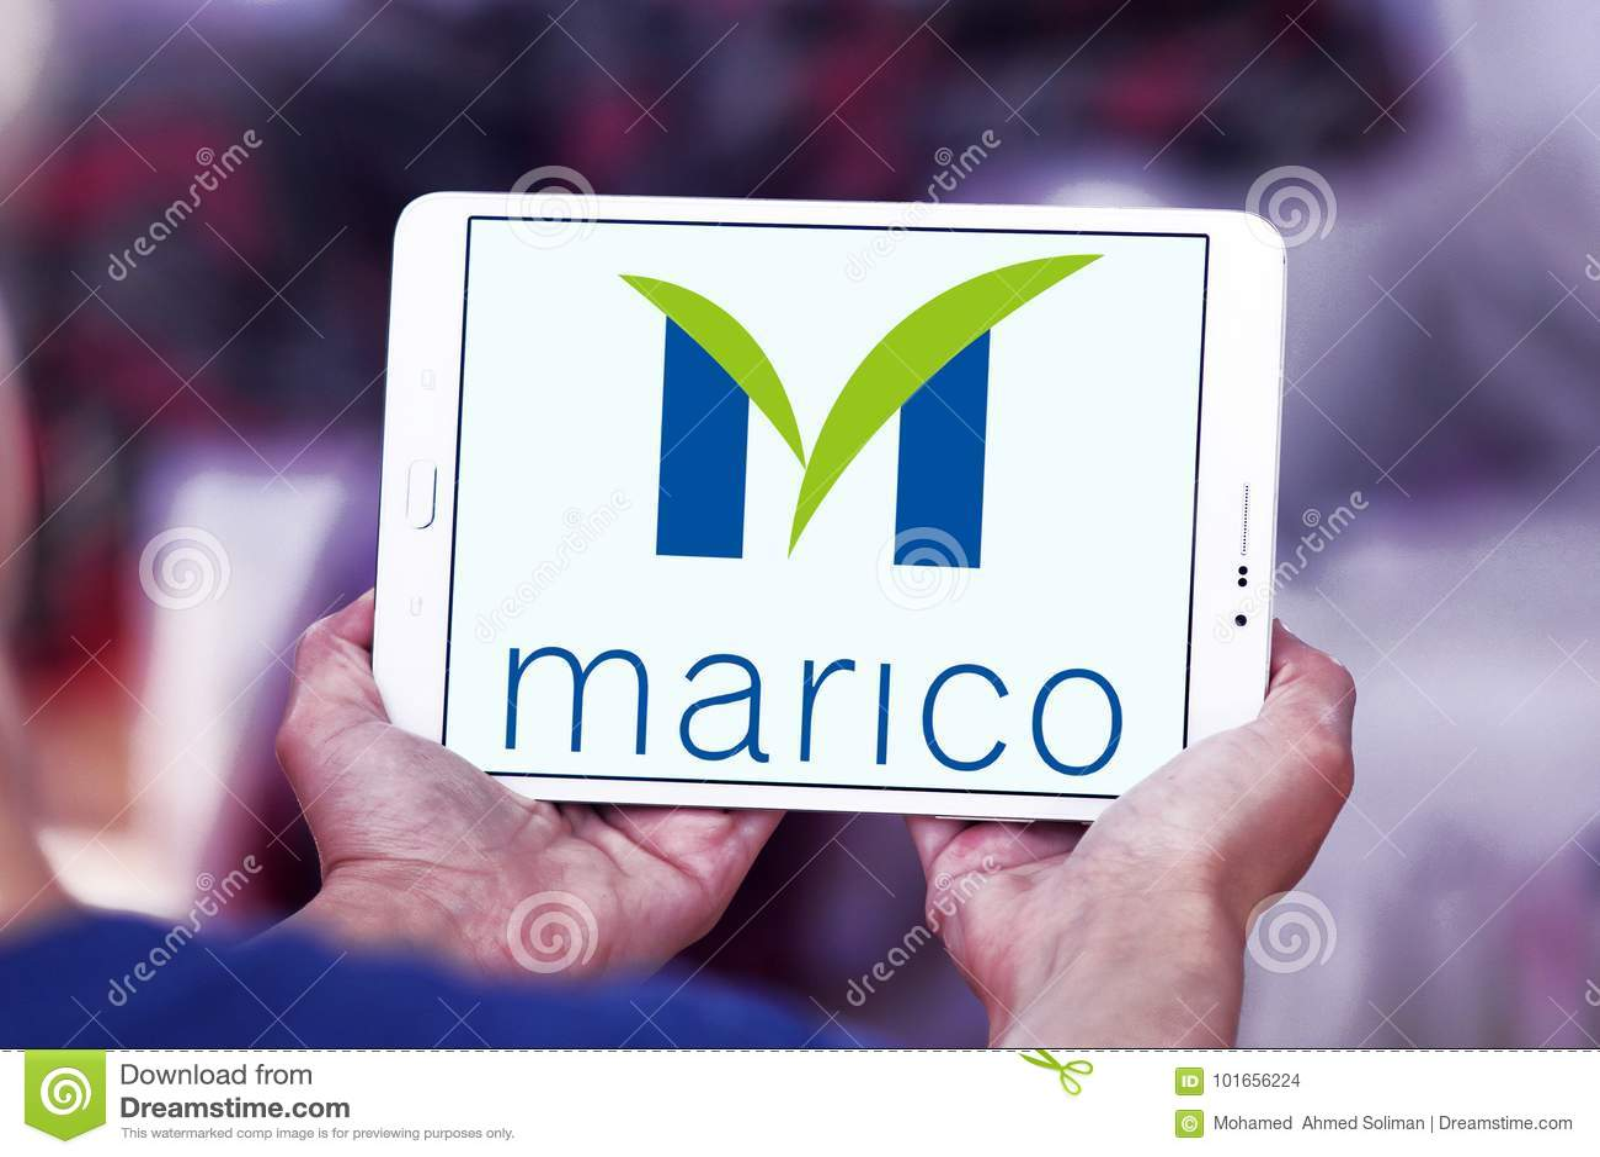 Marico goods company logo editorial stock image  Image of